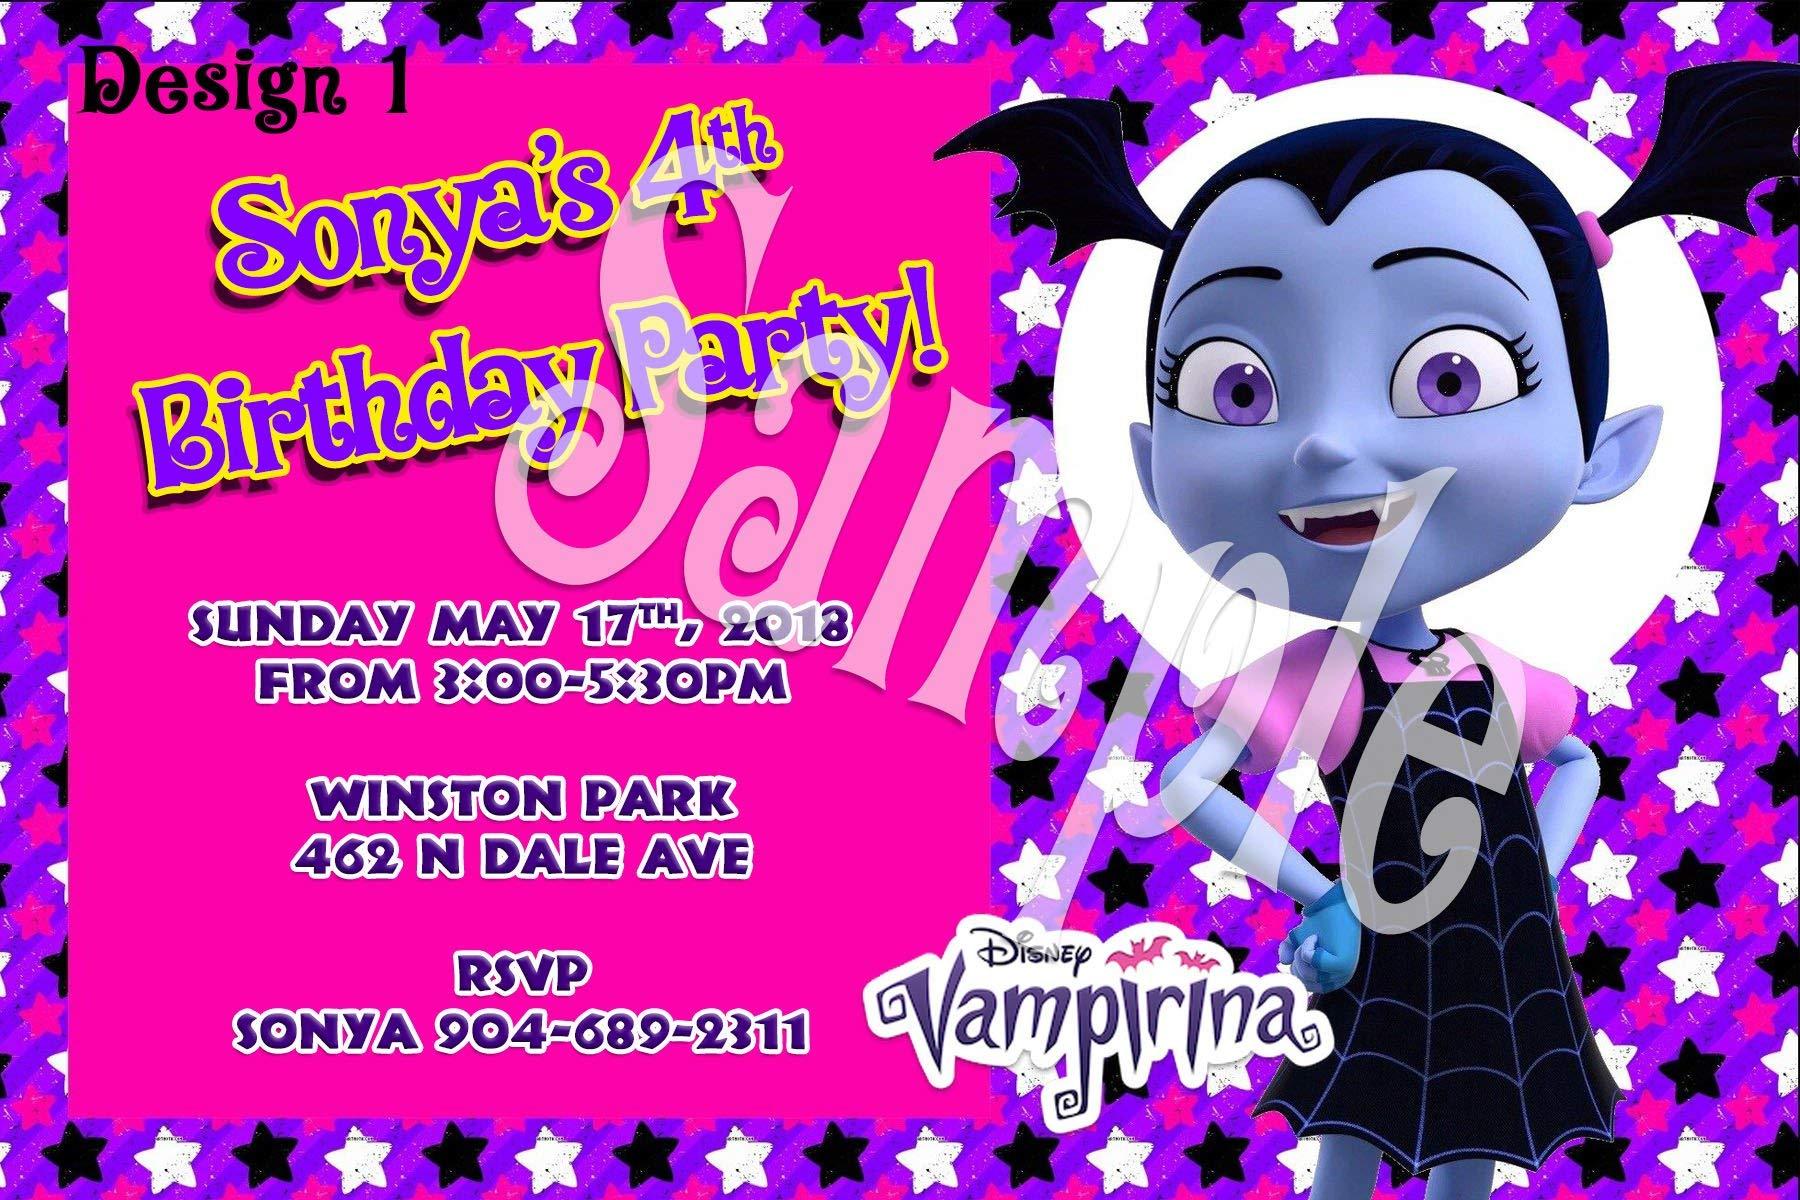 Vampirina Personalized Birthday Invitations More Designs Inside!